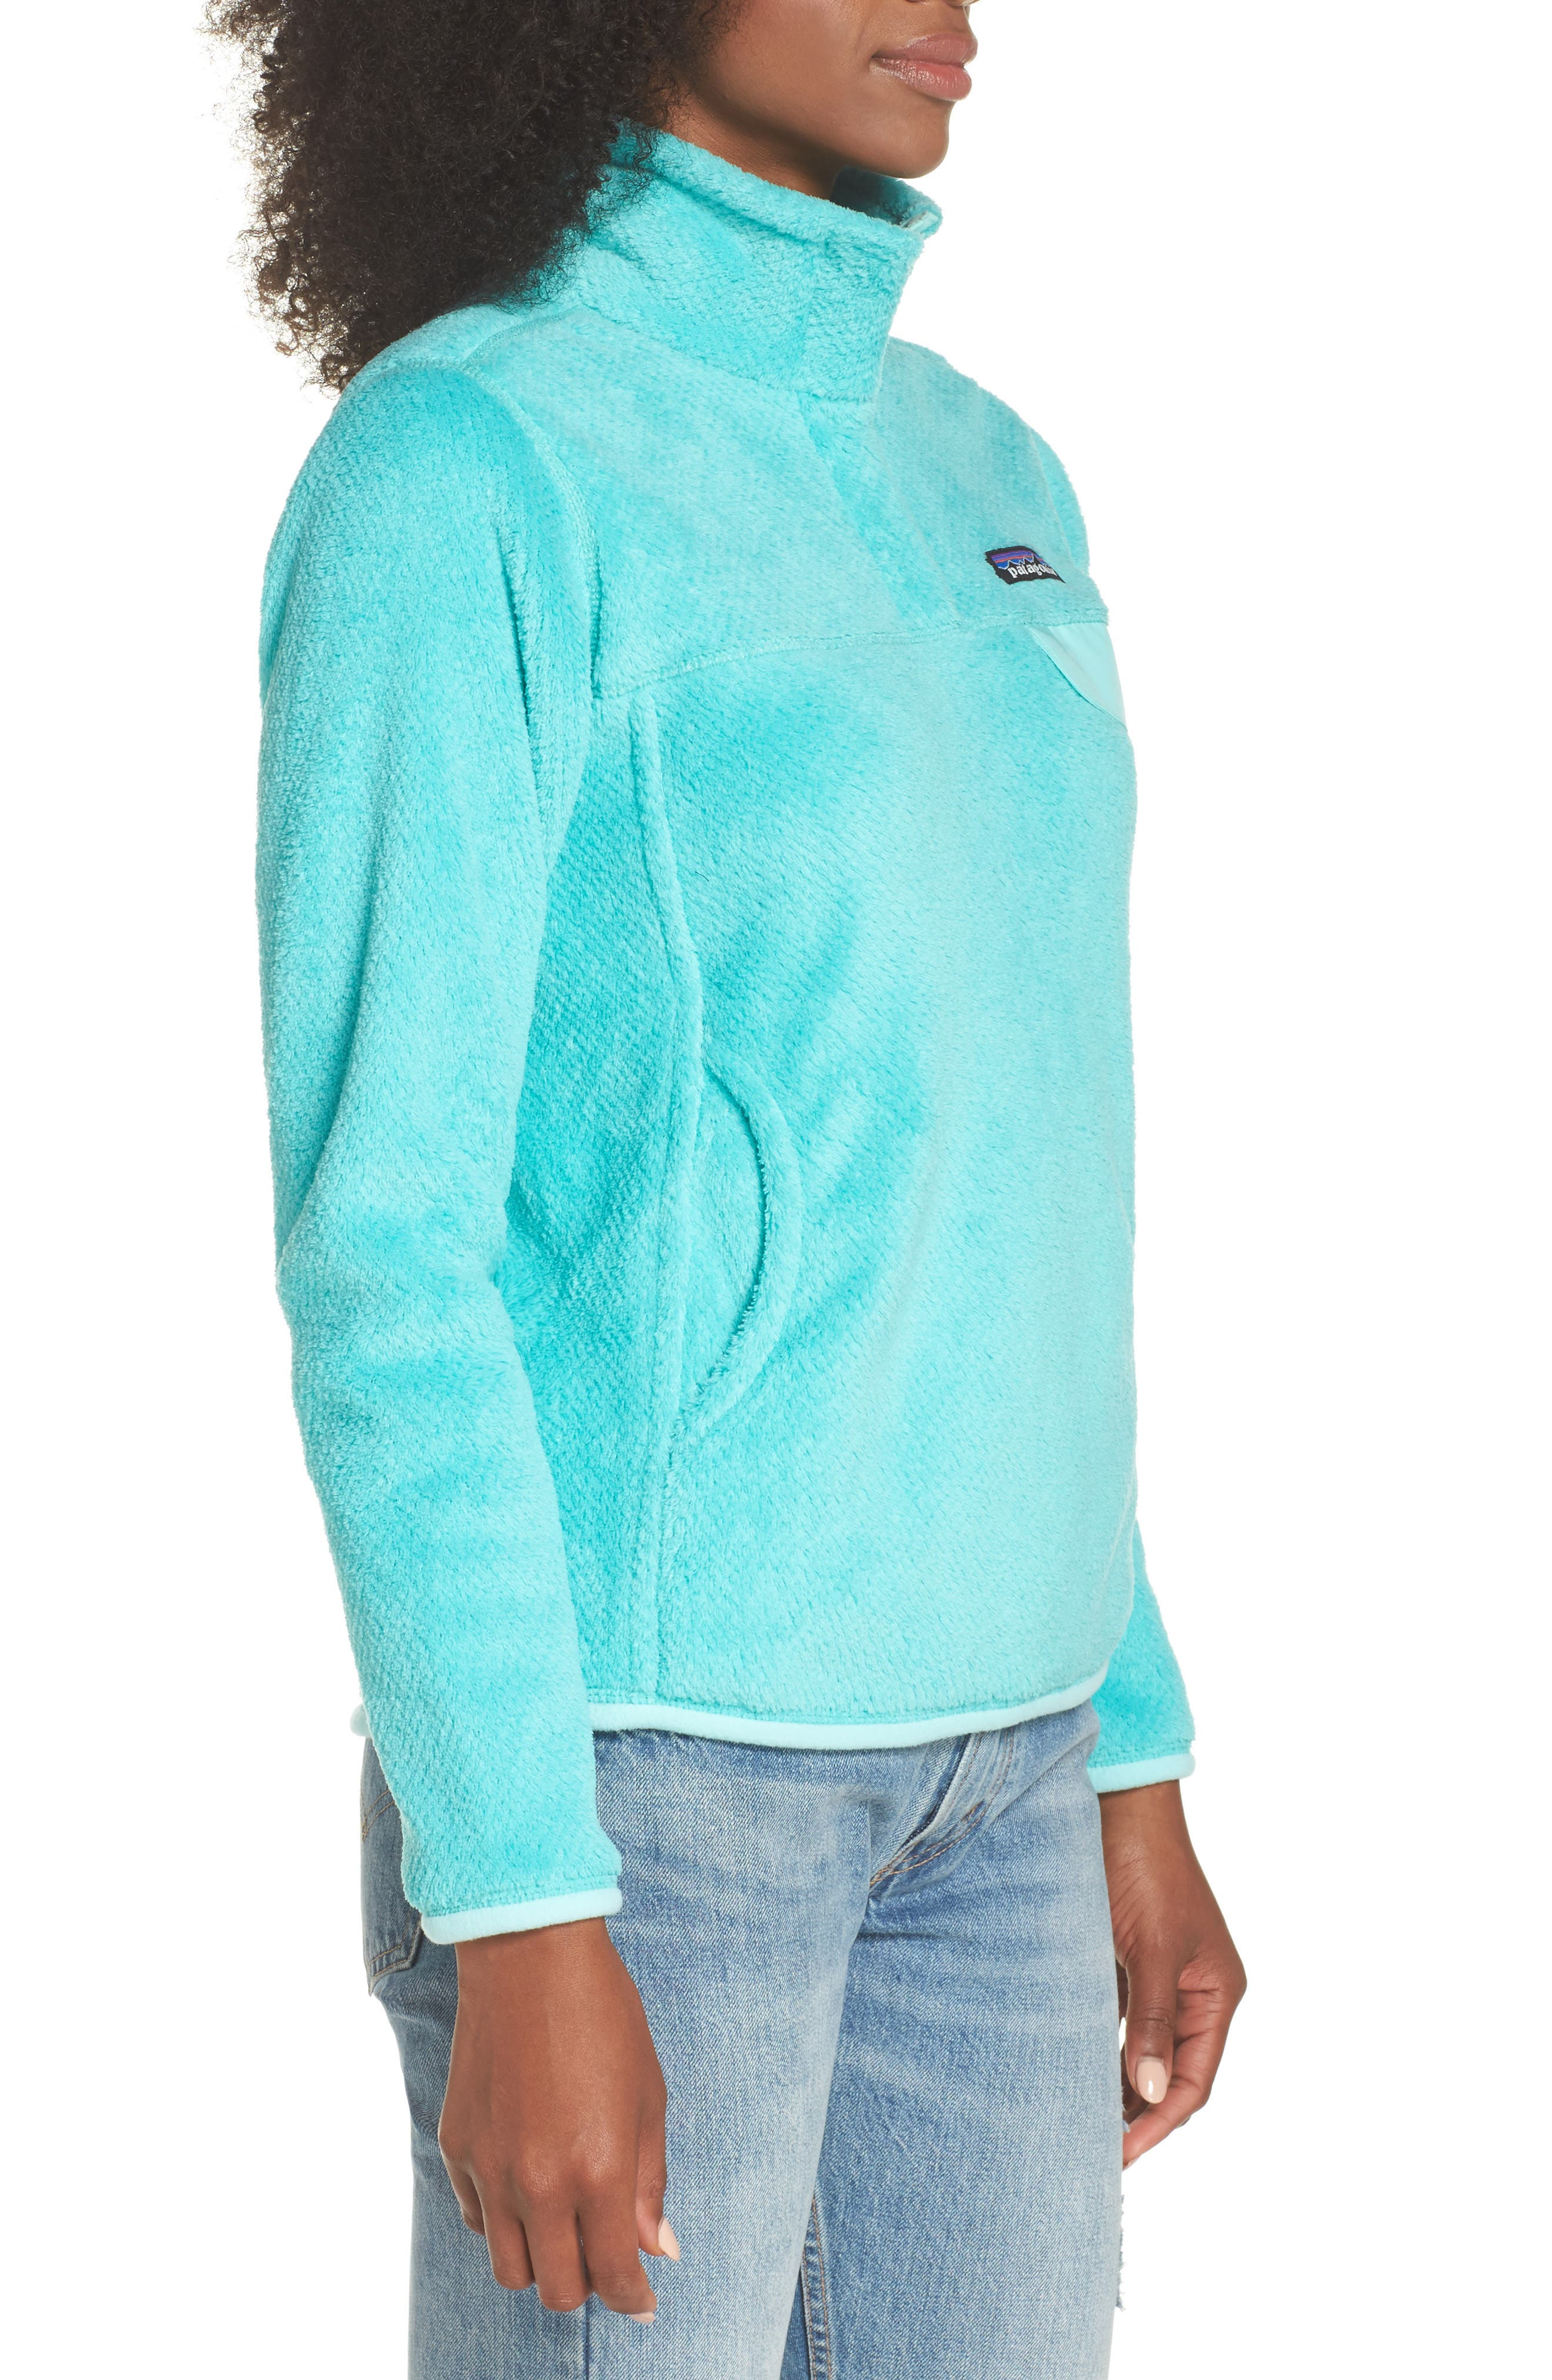 Re-Tool Snap-T<sup>®</sup> Fleece Pullover,                             Alternate thumbnail 3, color,                             Bend Blue/ Strait Blue X Dye